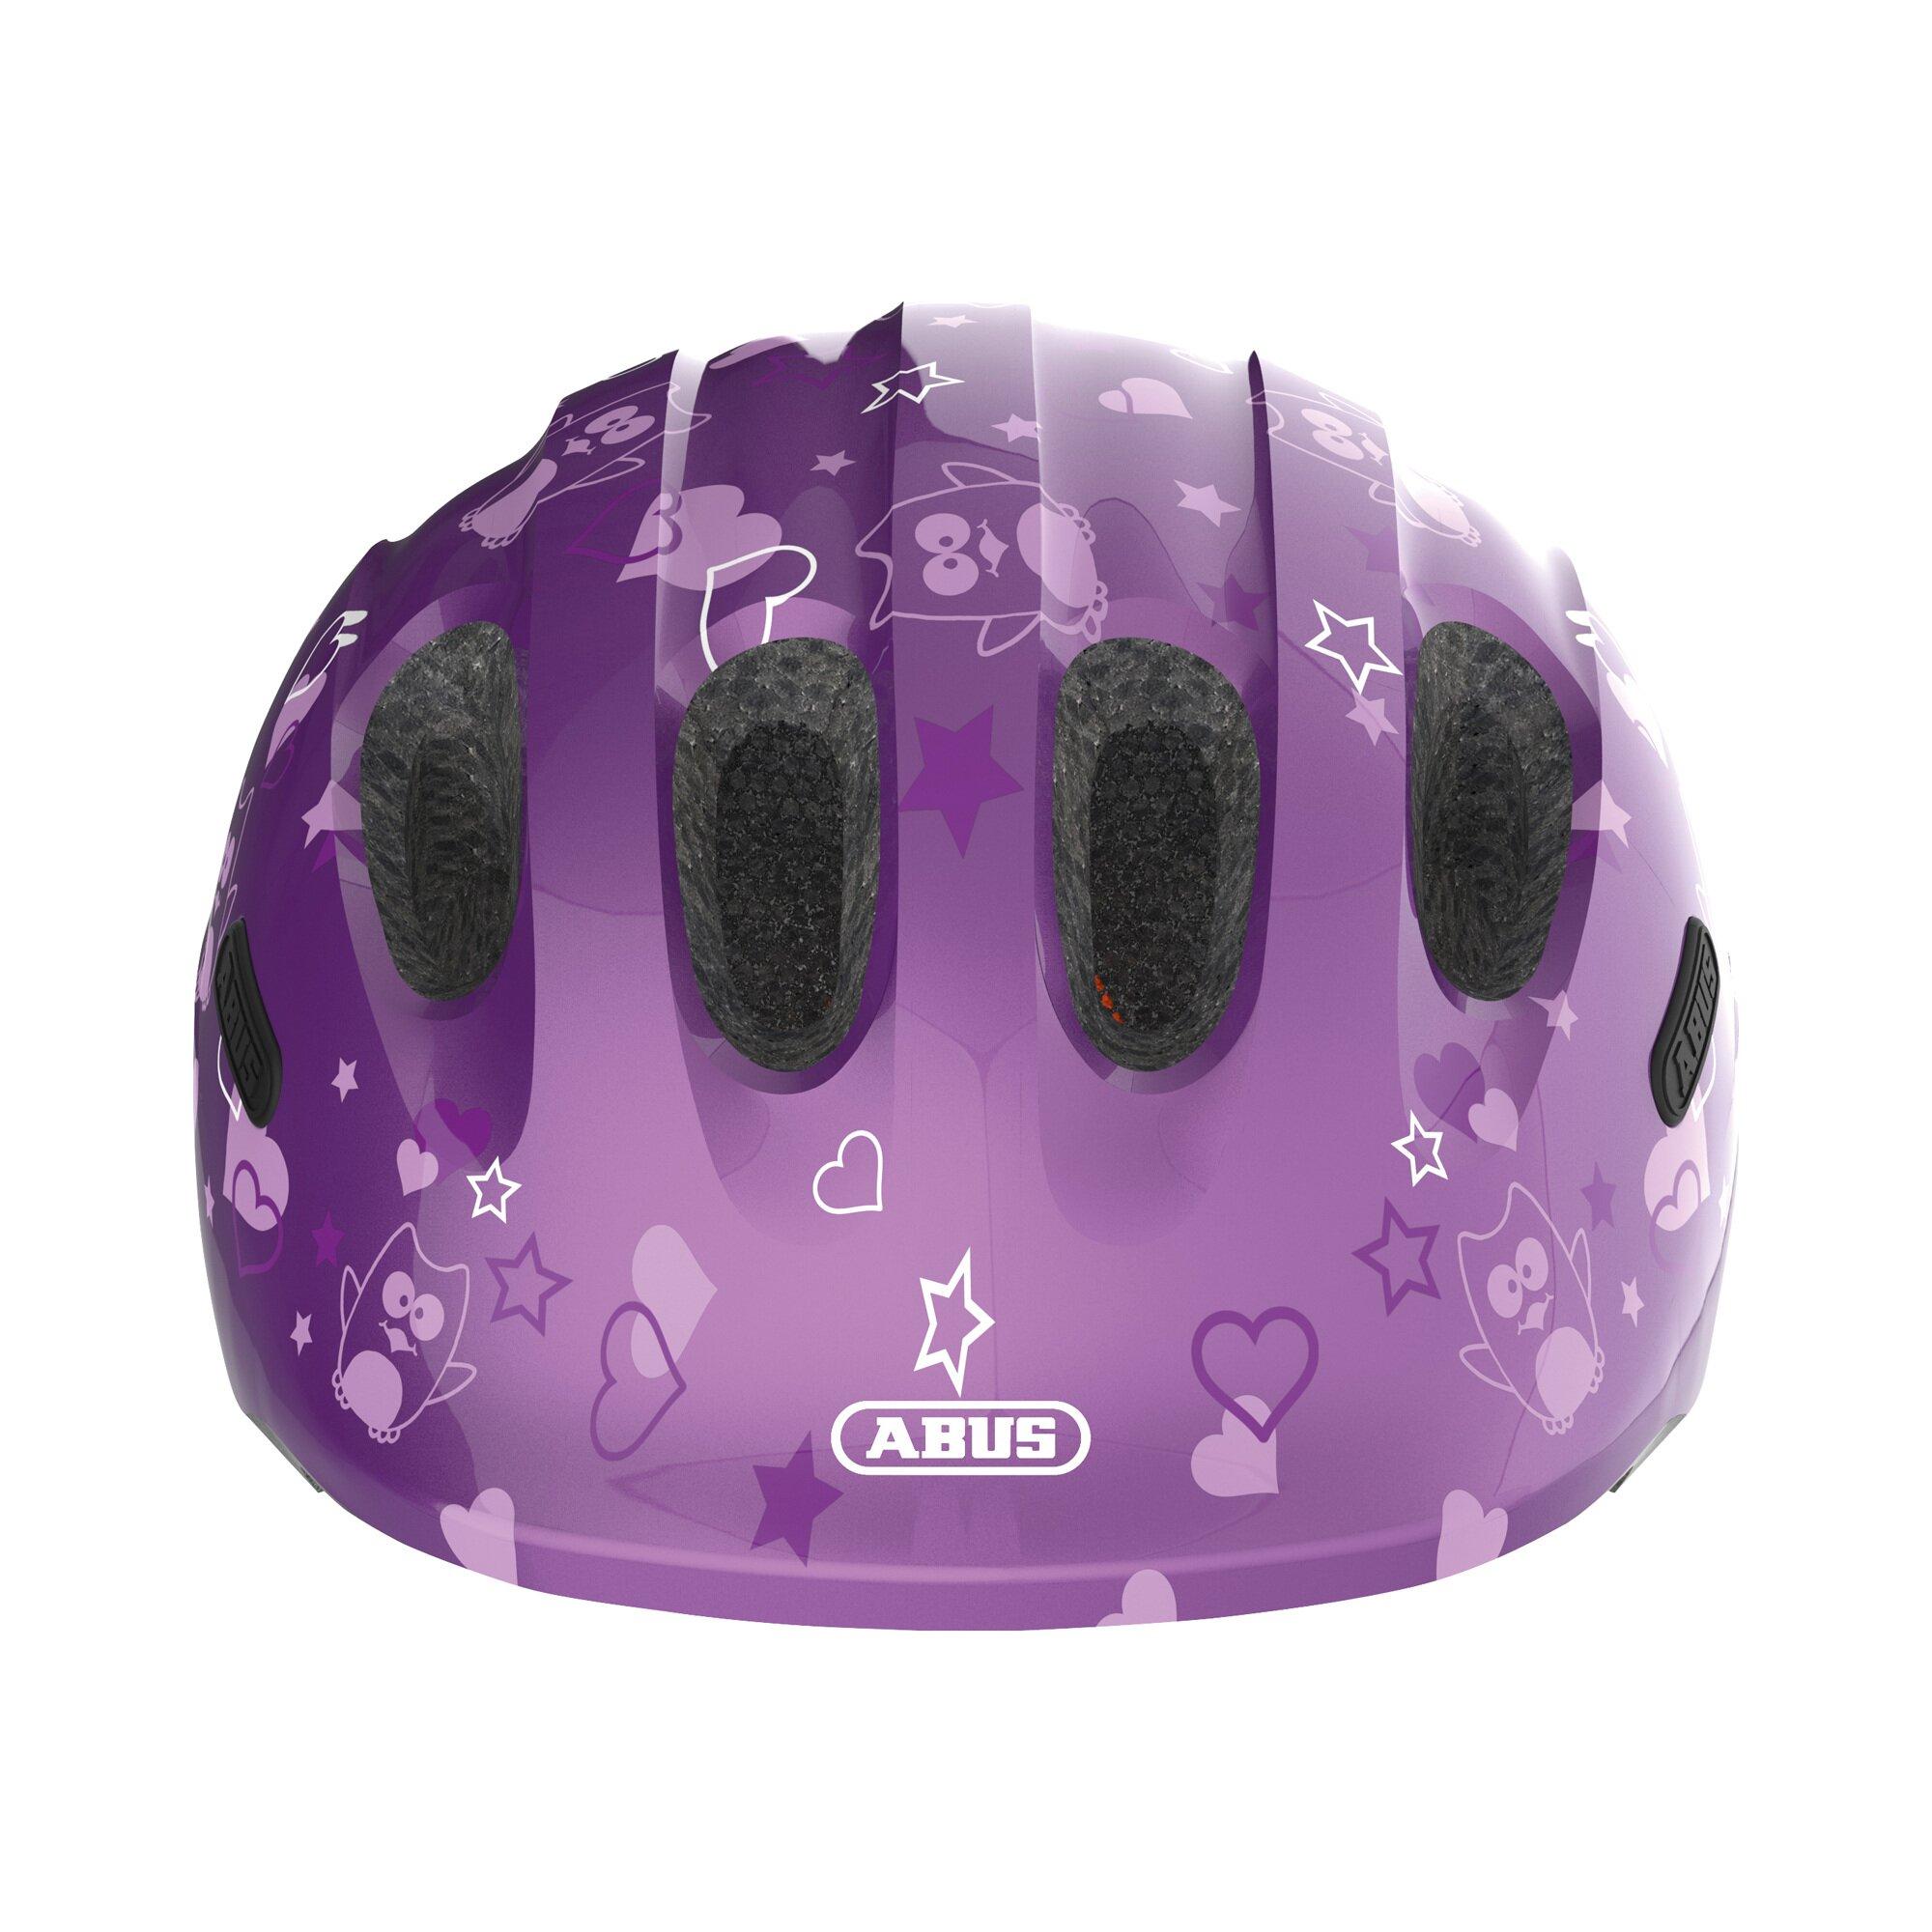 abus-fahrradhelm-smiley-2-0-purple-star